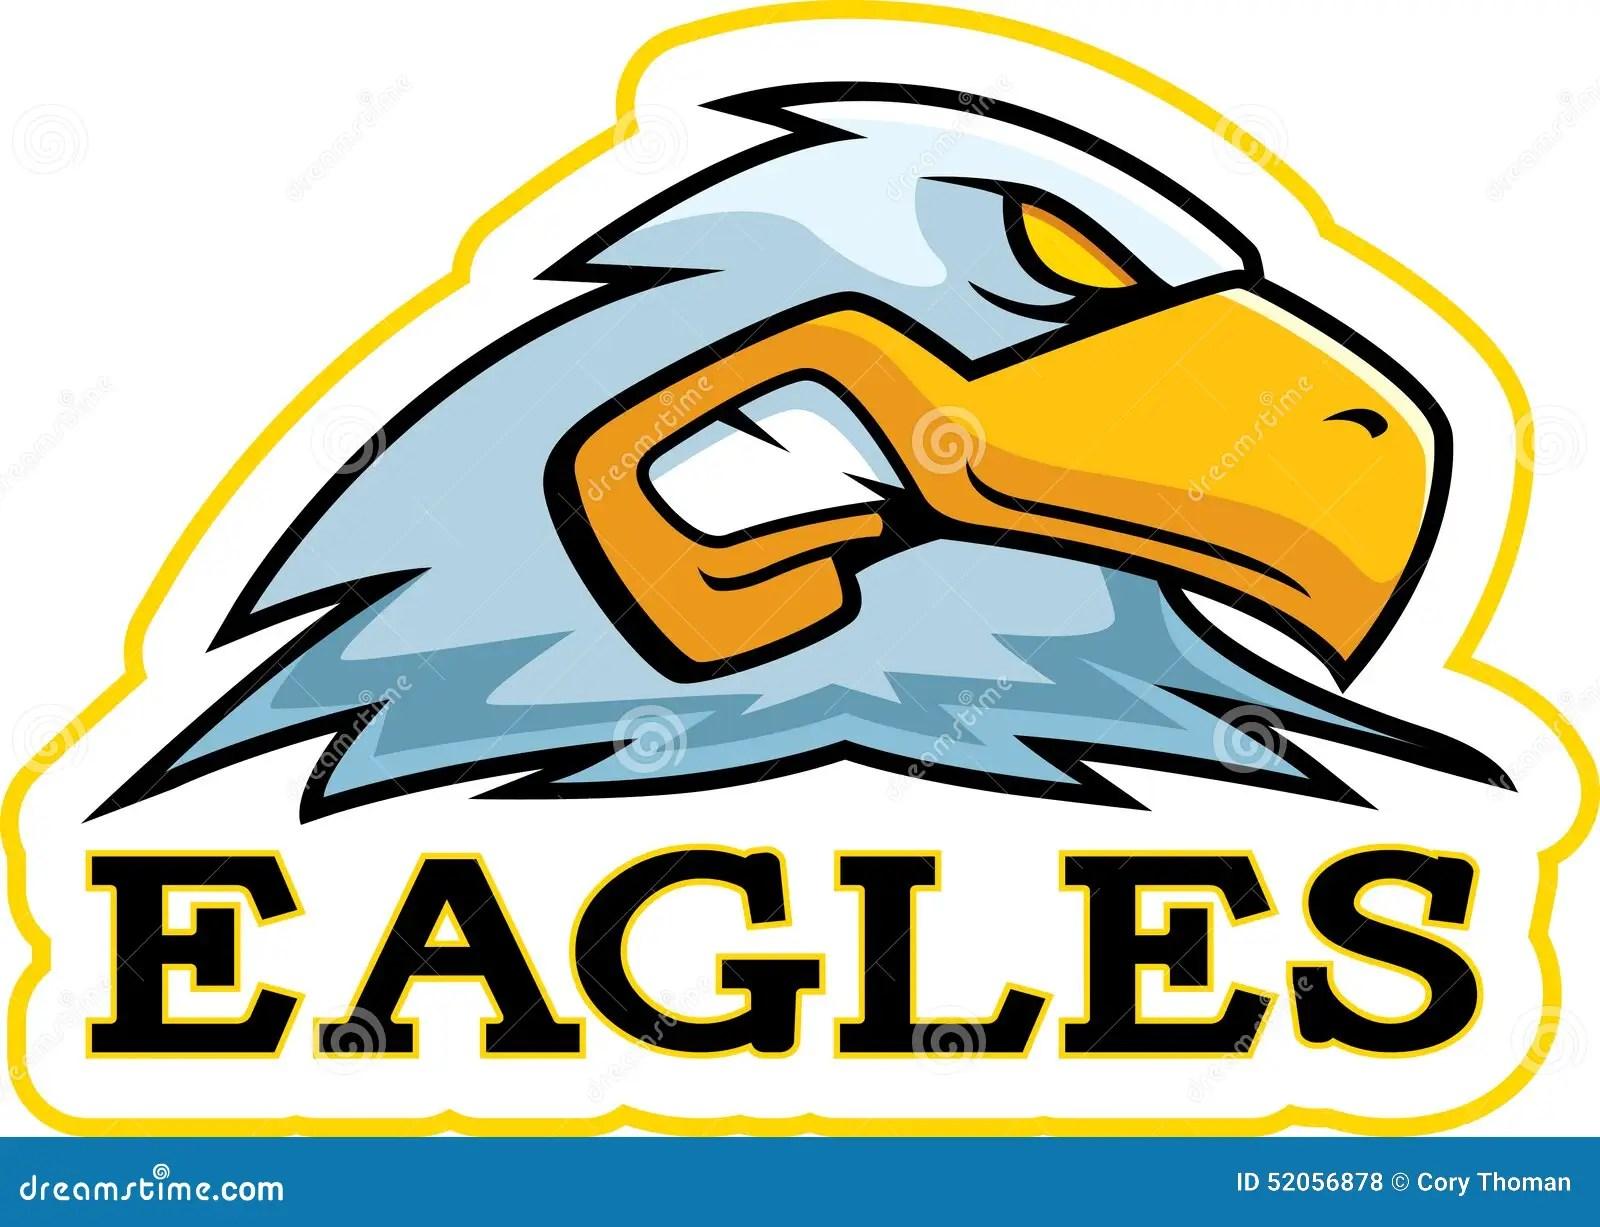 hight resolution of a cartoon illustration of an eagle mascot head